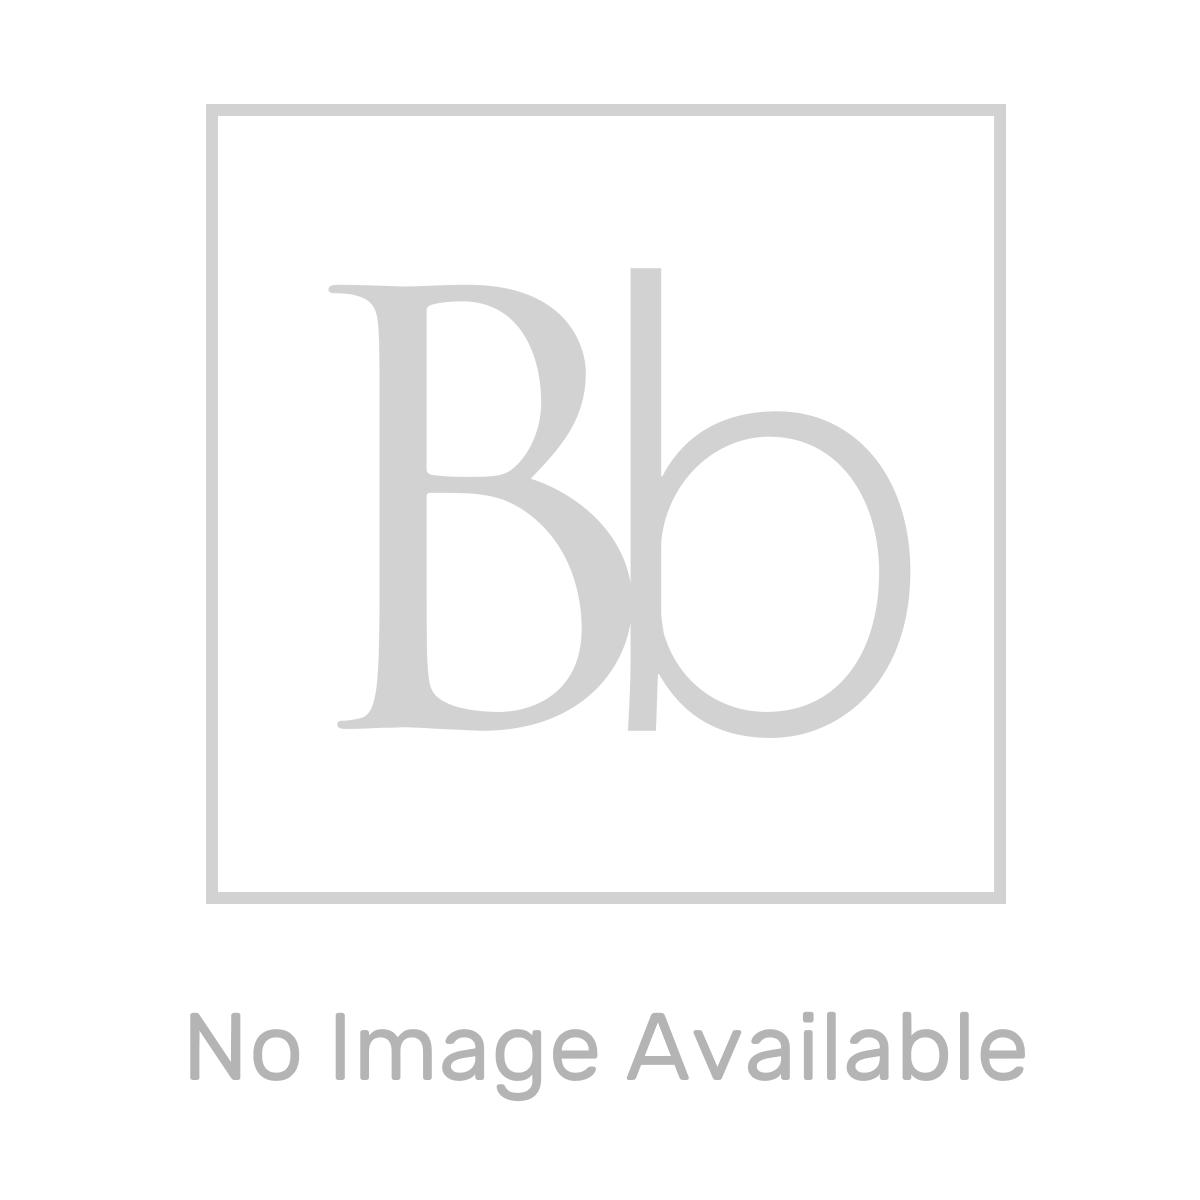 RAK Series 600 Bathroom Suite with Pivot Shower Enclosure